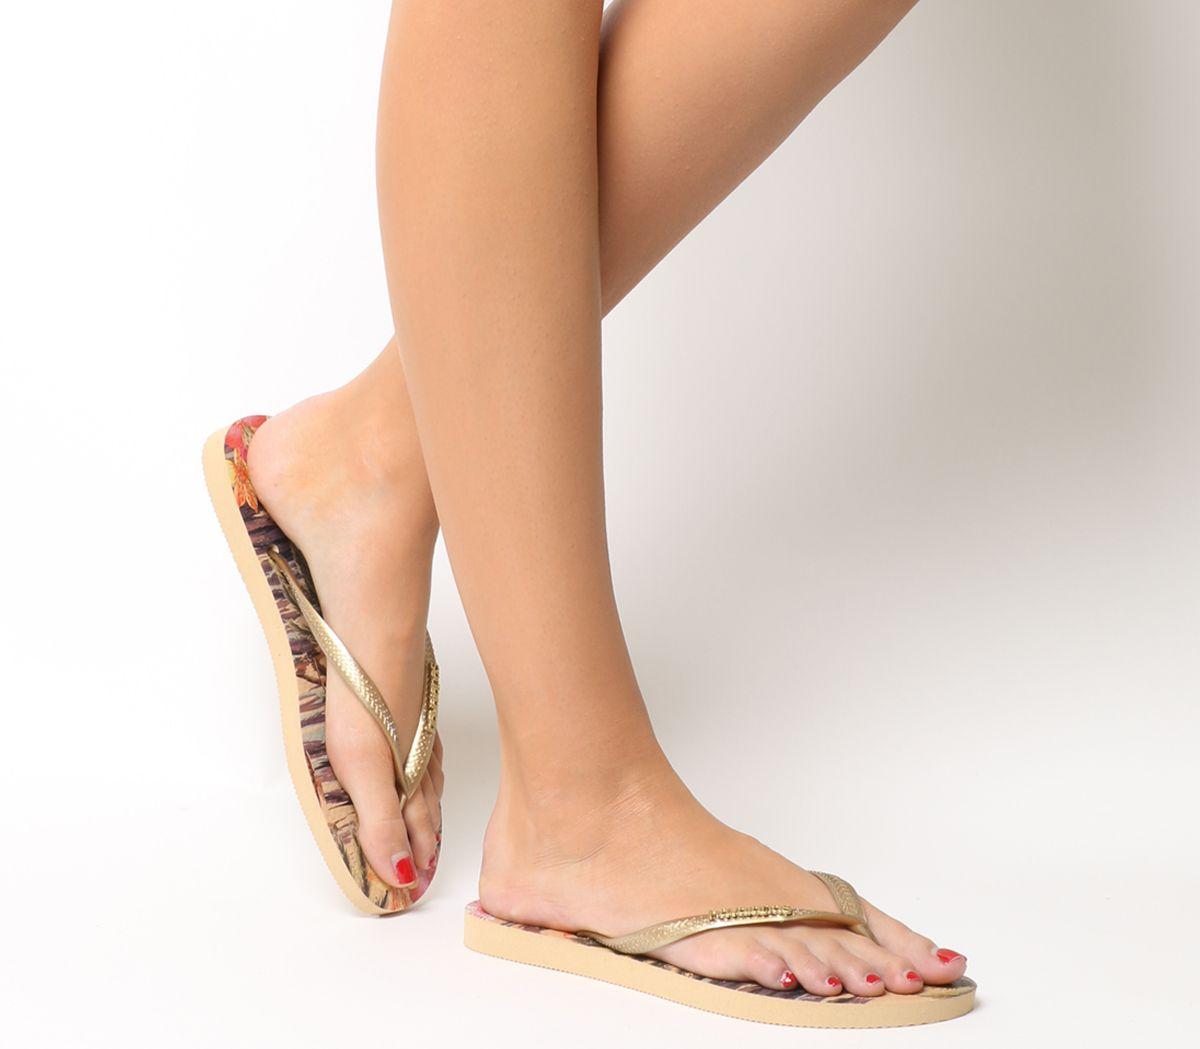 bcff2ed54 Havaianas Slim Tropical Flip Flops Ivory - Sandals